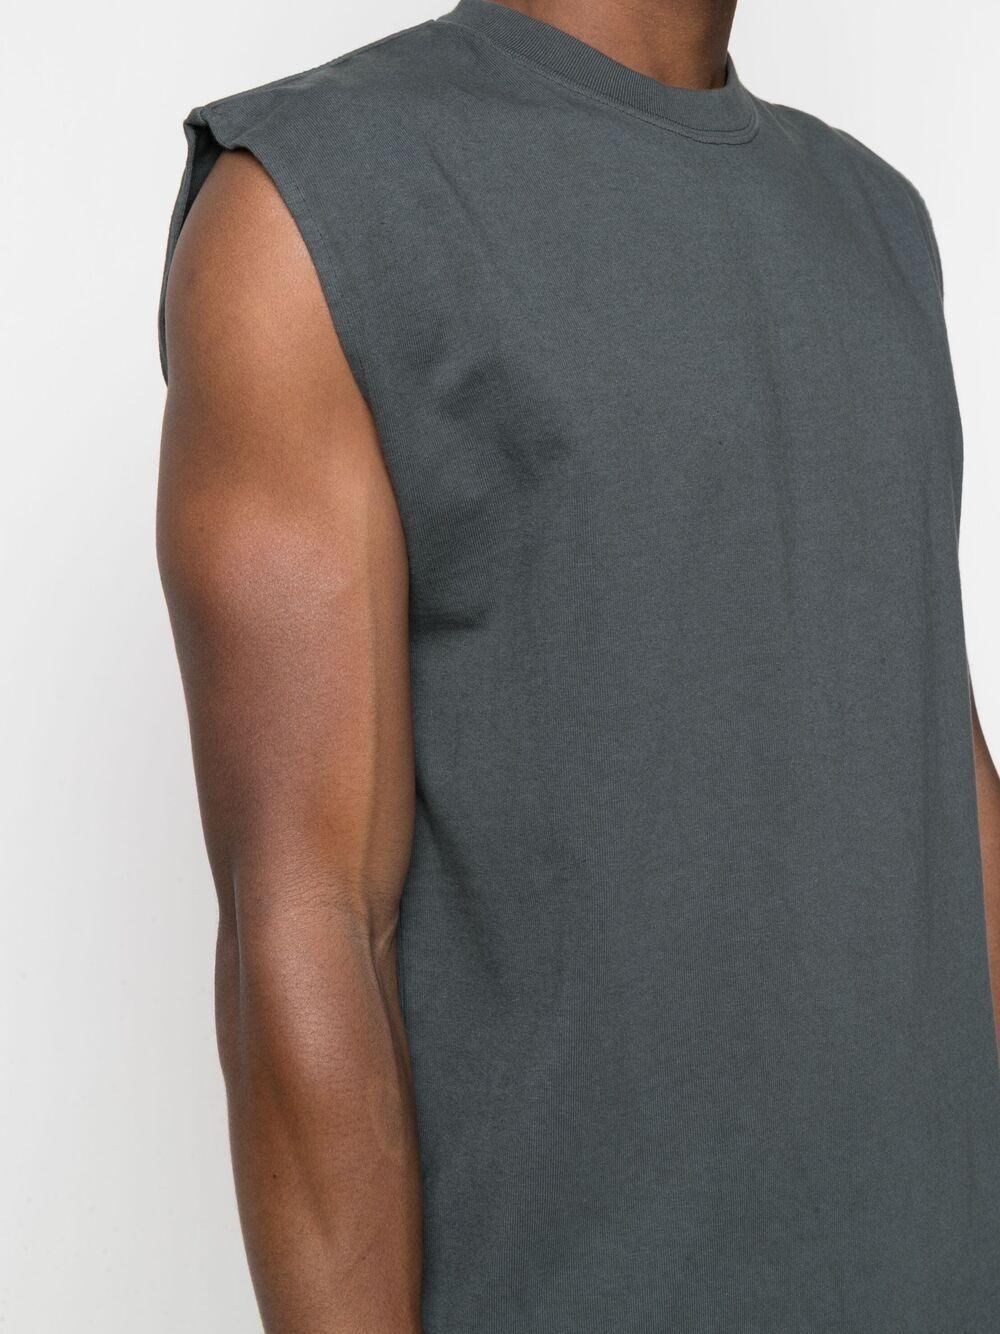 Gr10k sleeveless top man anthracite grey GR10K | T-shirts | GR017ANTRACITE